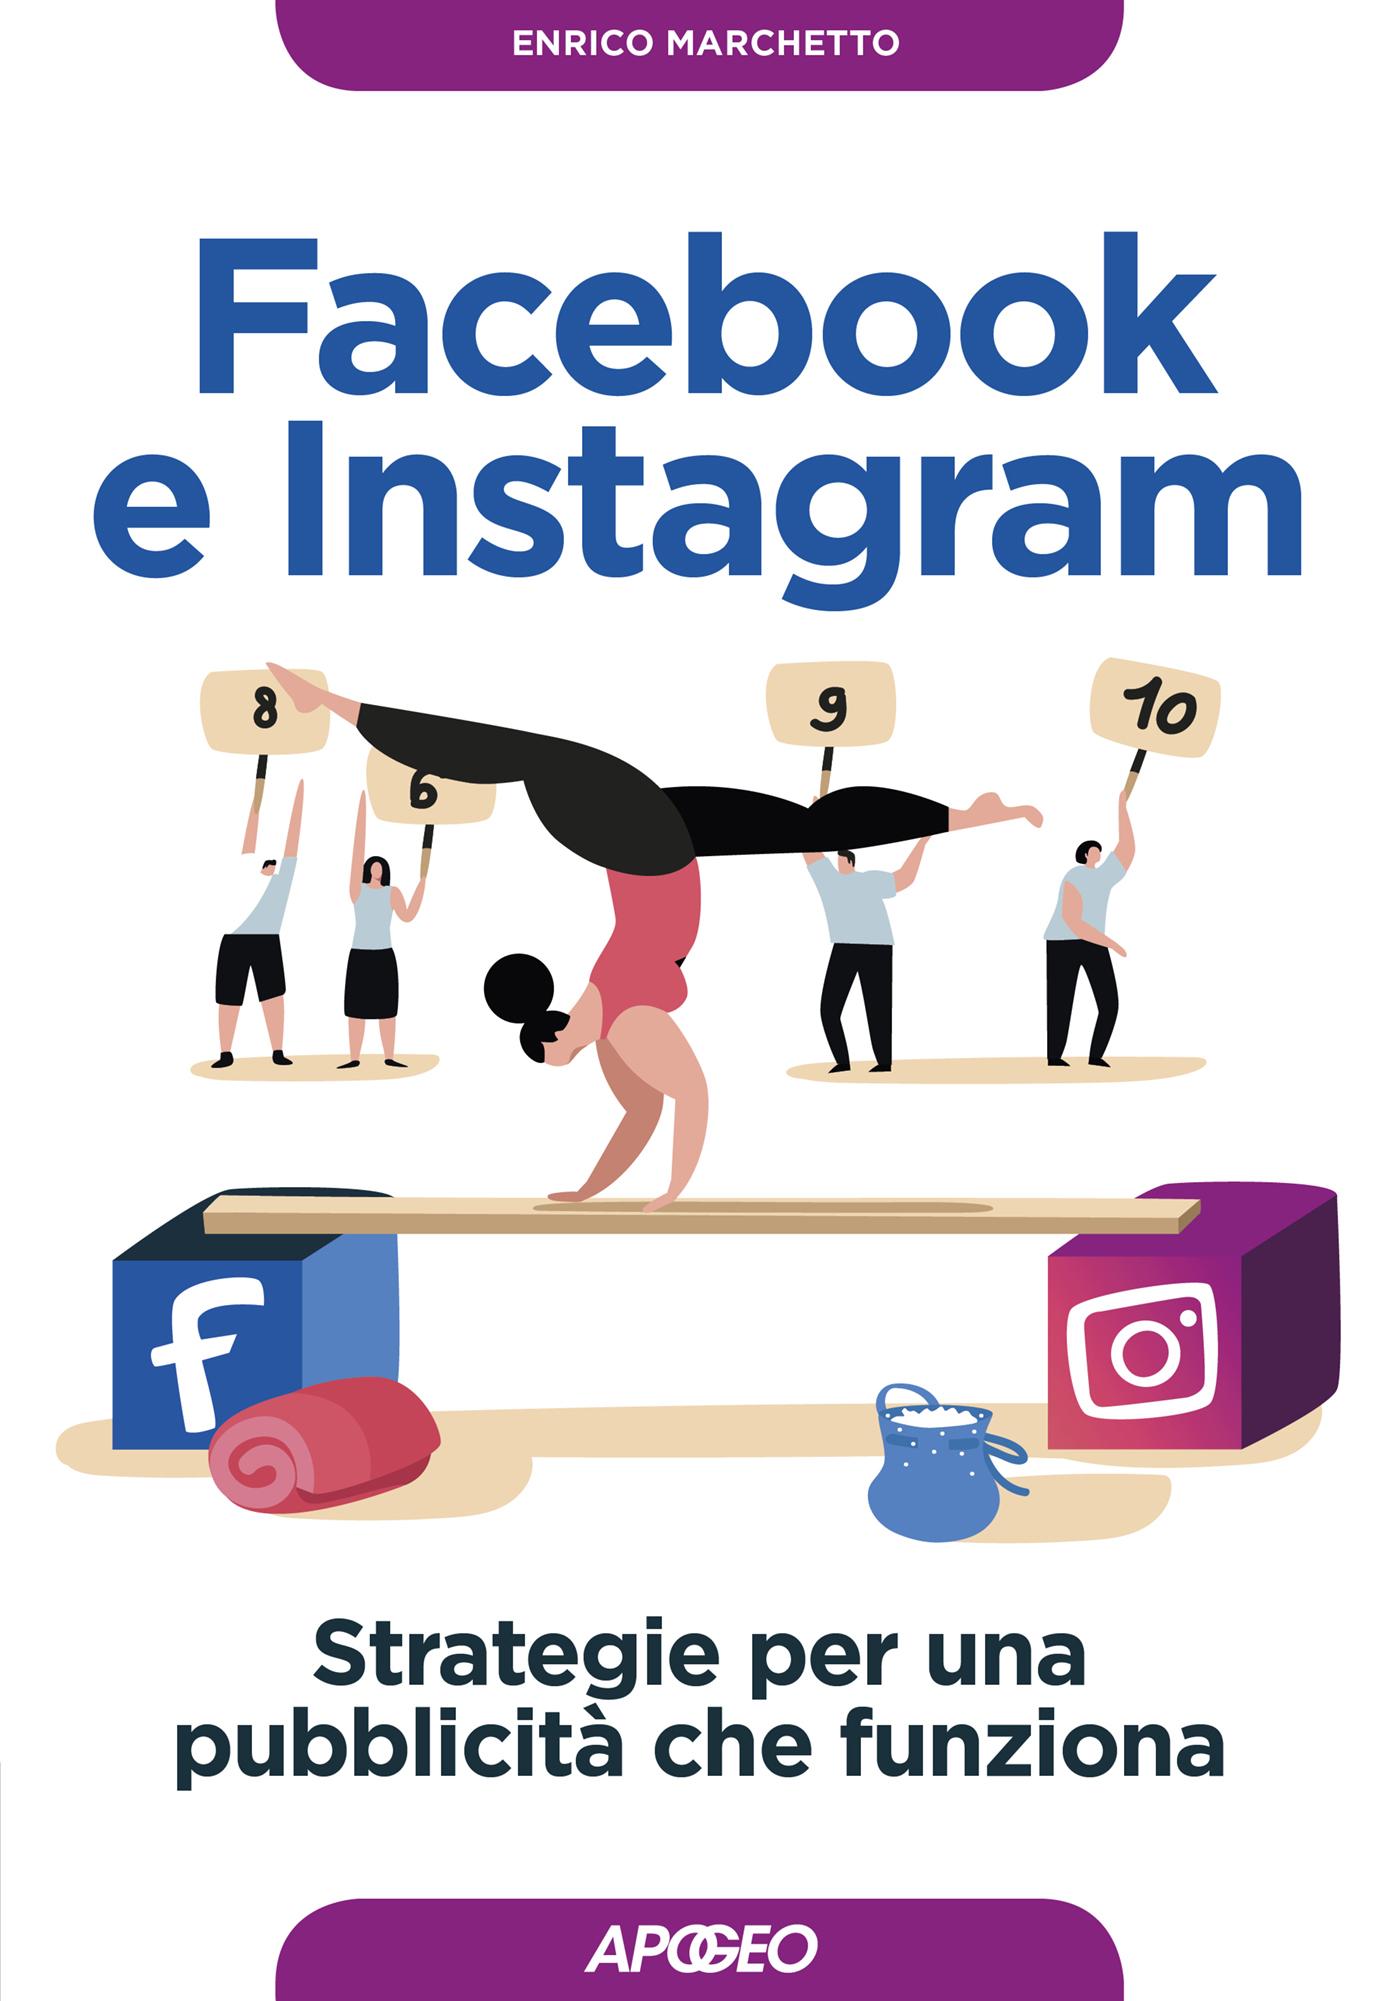 Facebook e Instagram - Strategie per una pubblicità che funziona